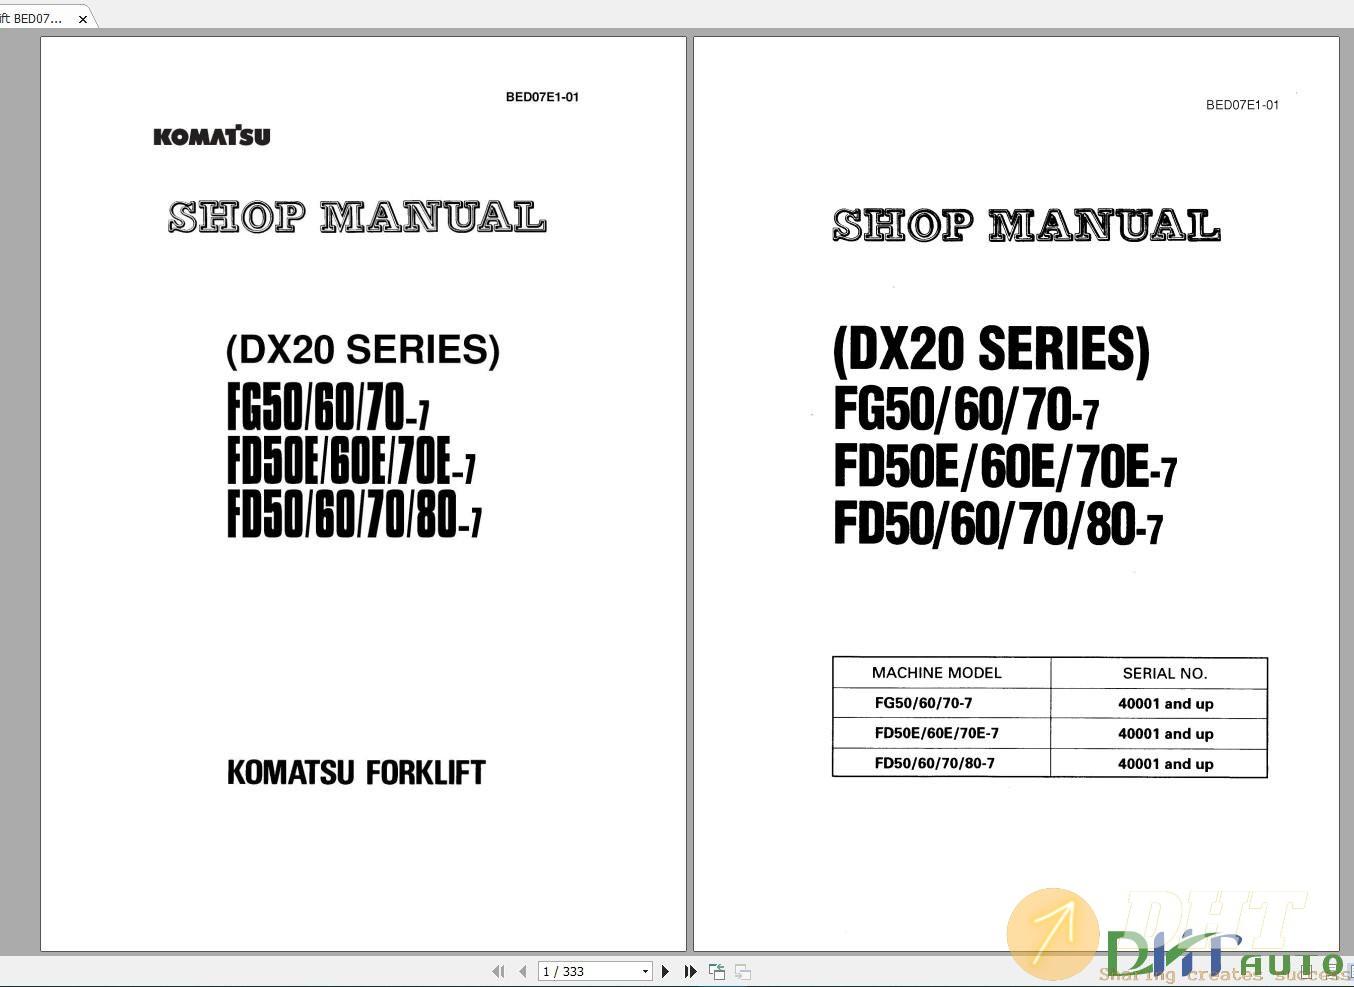 Komatsu-Forklift-Shop-Manual-PDF-Full-5.jpg